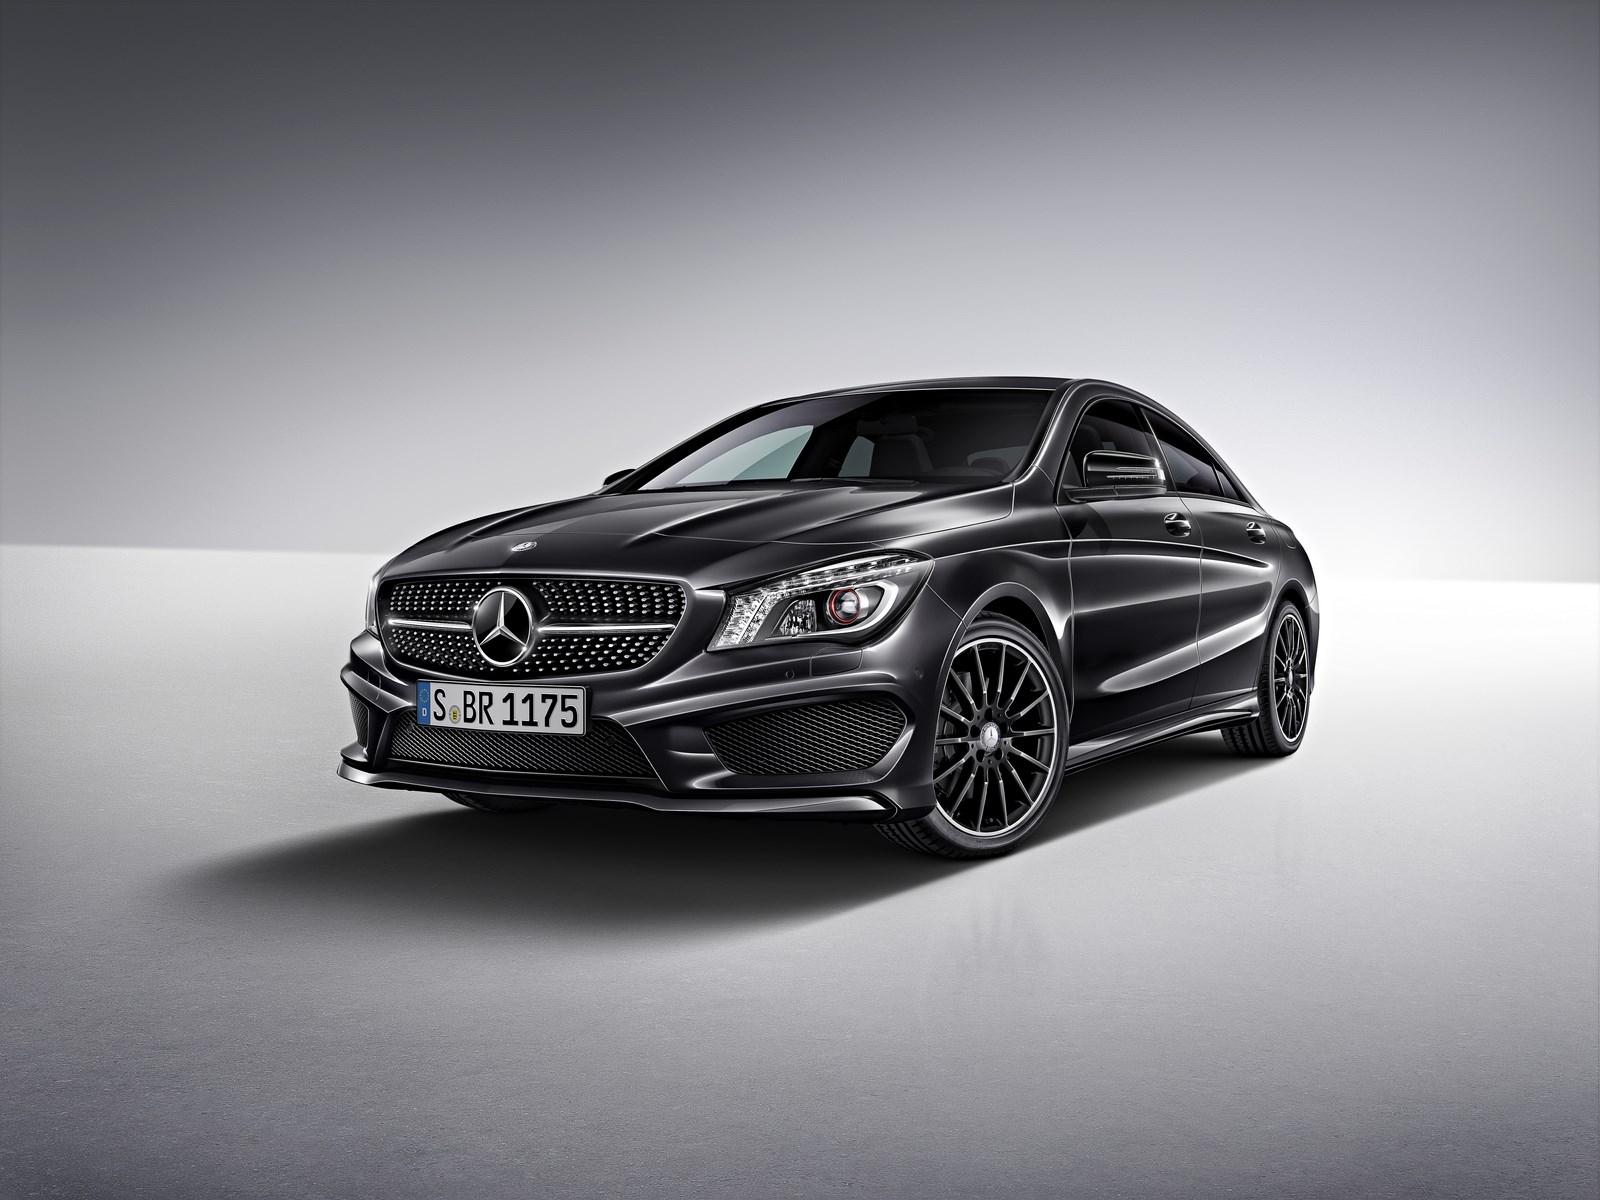 Mercedes benz cla edition 1 for Mercedes benz cla 250 sport 2013